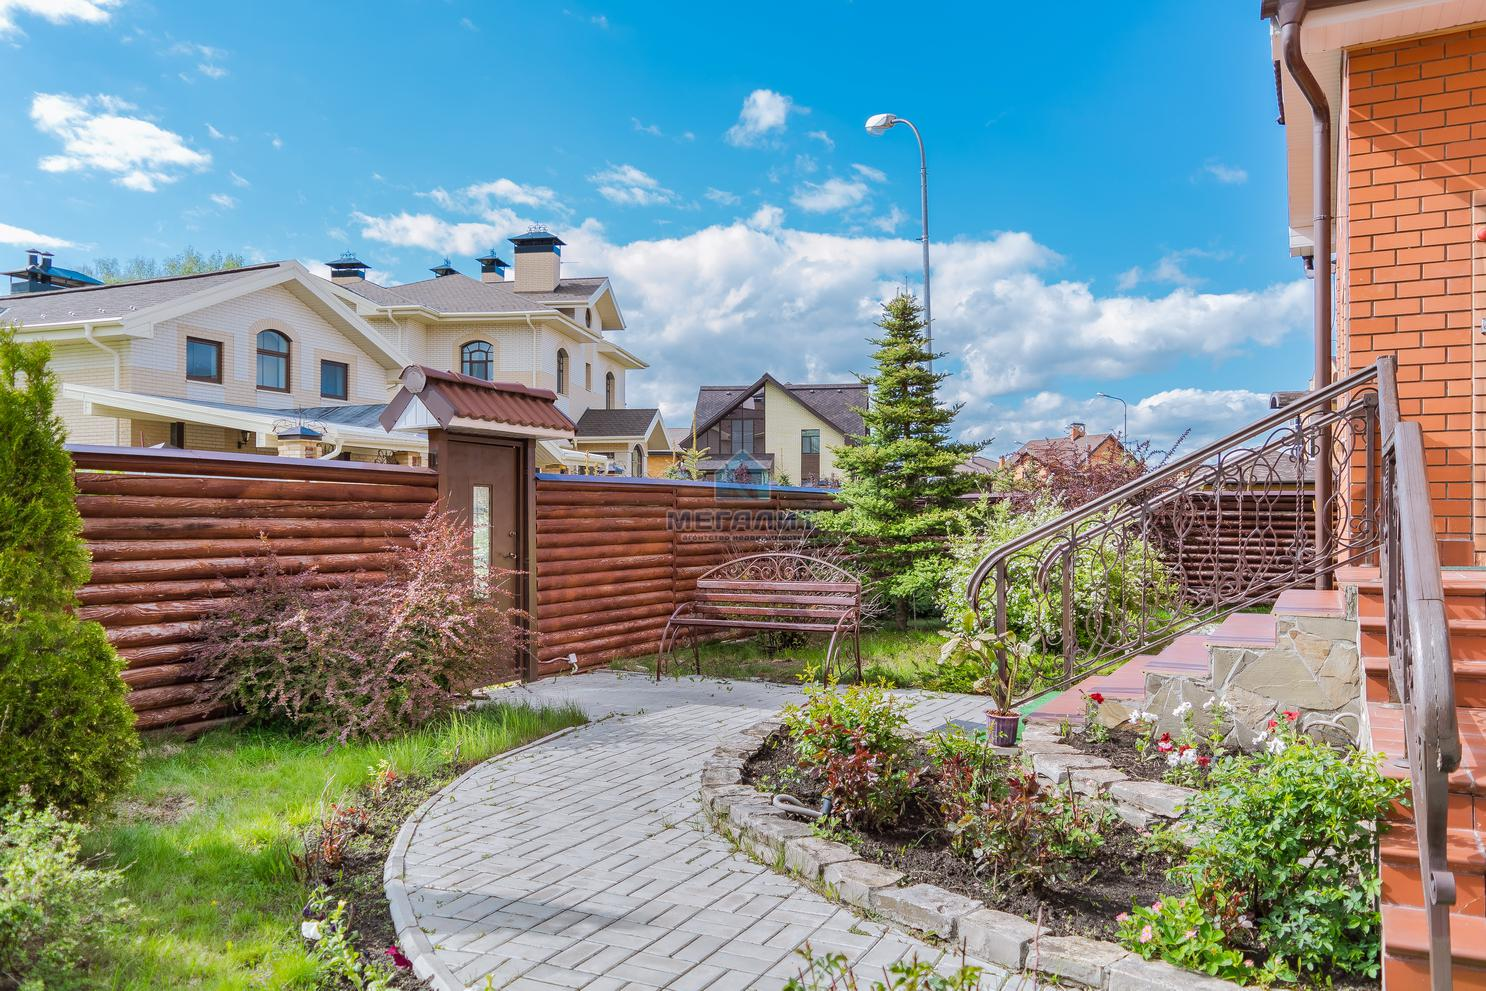 Продажа  дома Ромашковая, 242 м² (миниатюра №34)